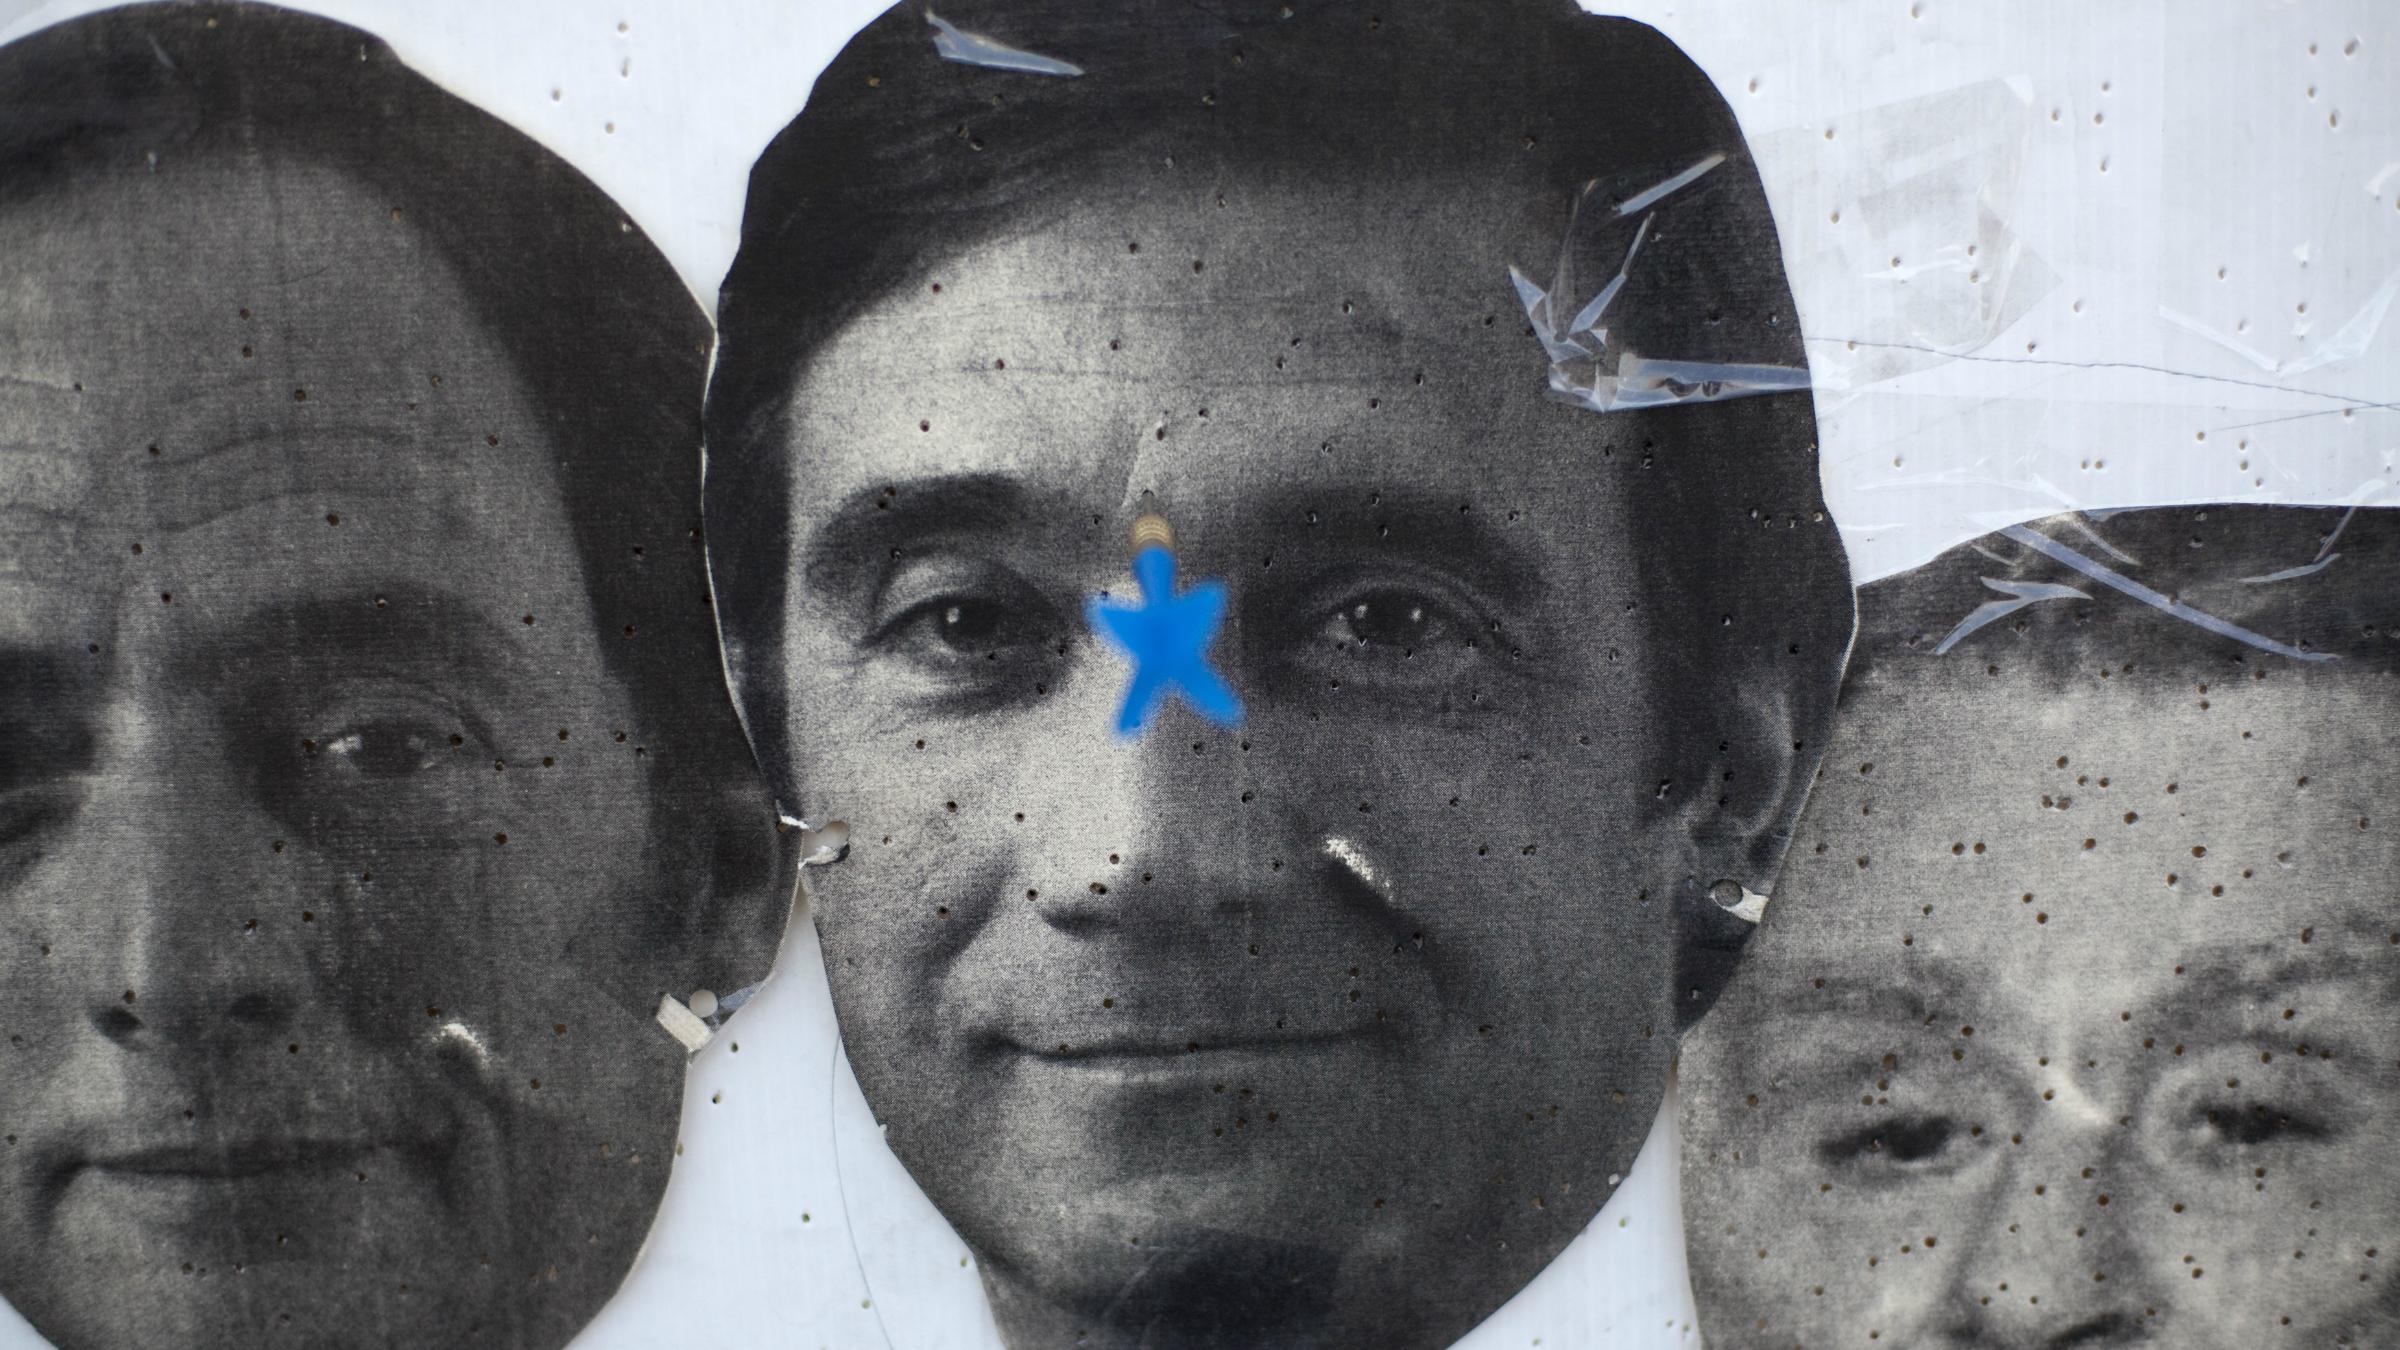 portugal politics pedro passos coelho paulo portas anibal cavaco silva